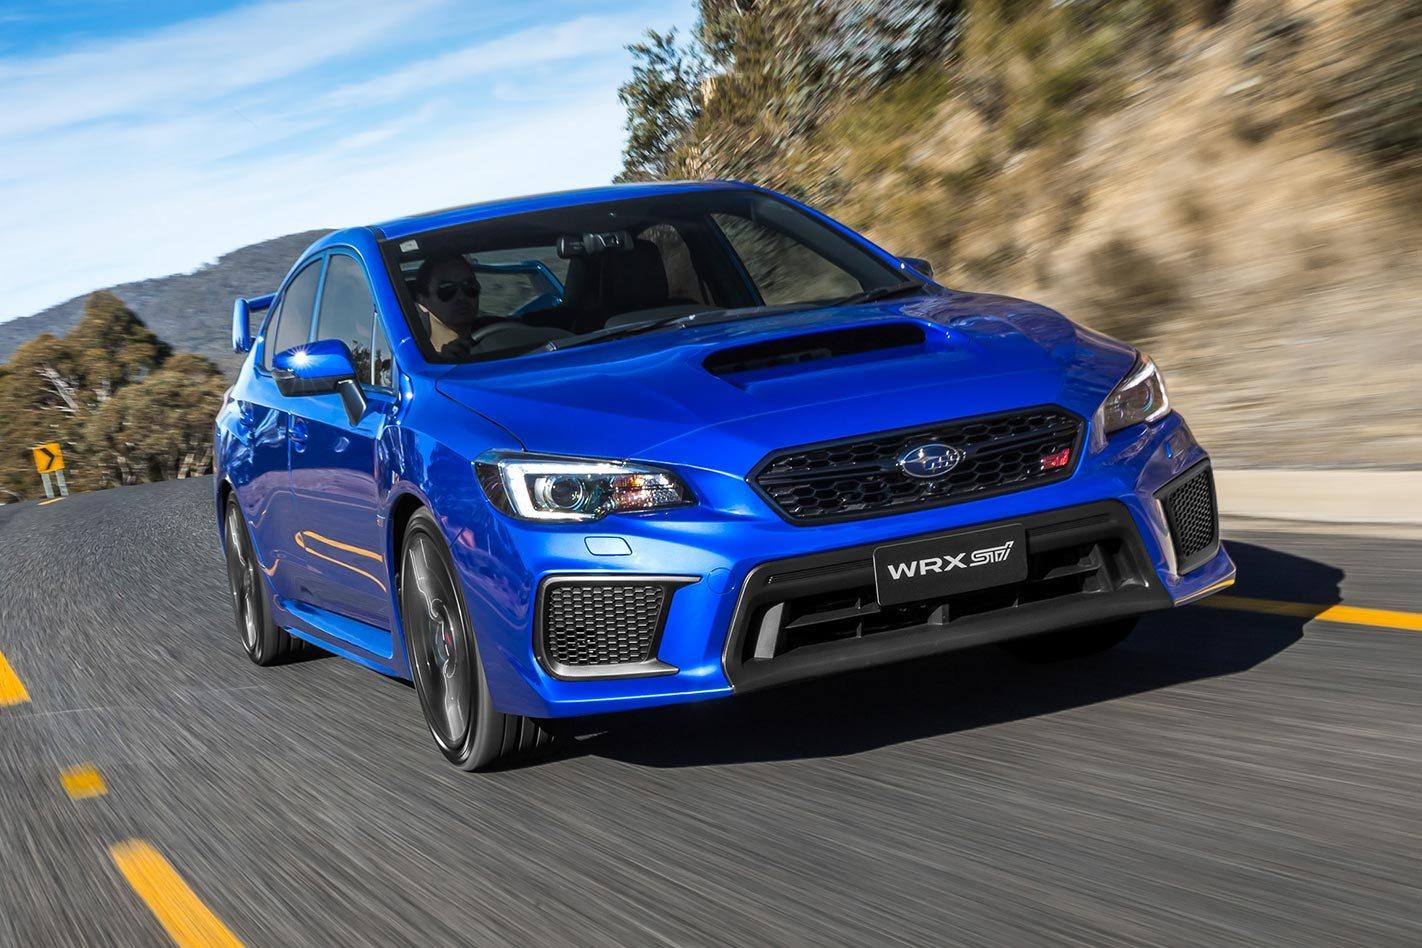 2018 Subaru WRX STI Australian pricing announced